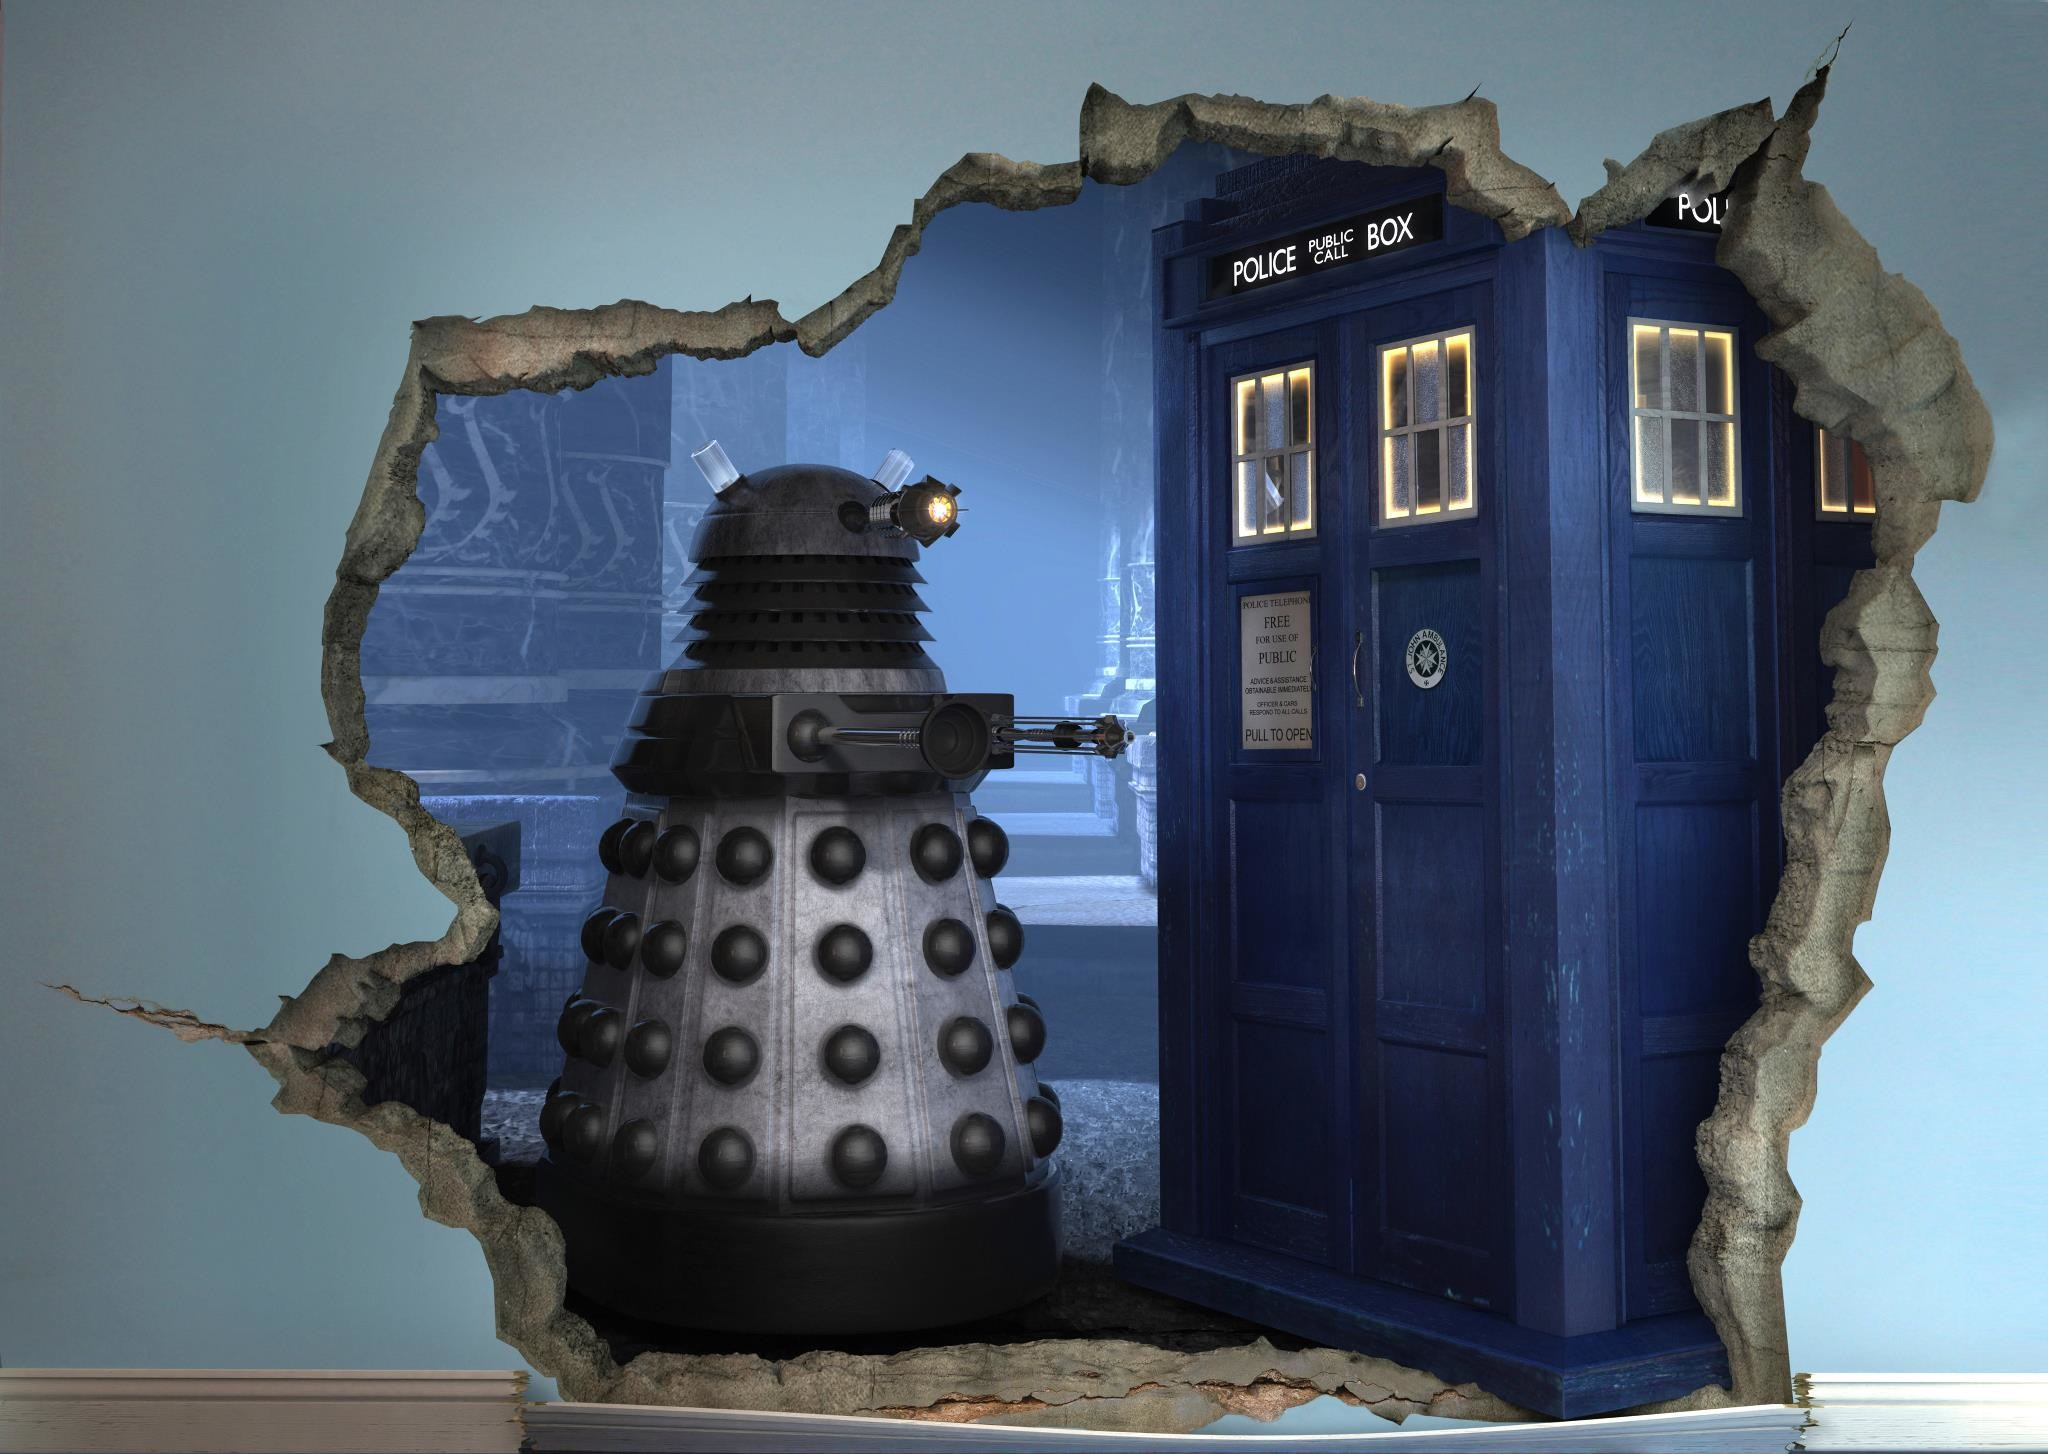 2048x1454 Exploding Tardis Mural Wallpaper Sticker Doctor Who Bedroom  Exploding Doctor Who Room Wallpaper 37 Images.